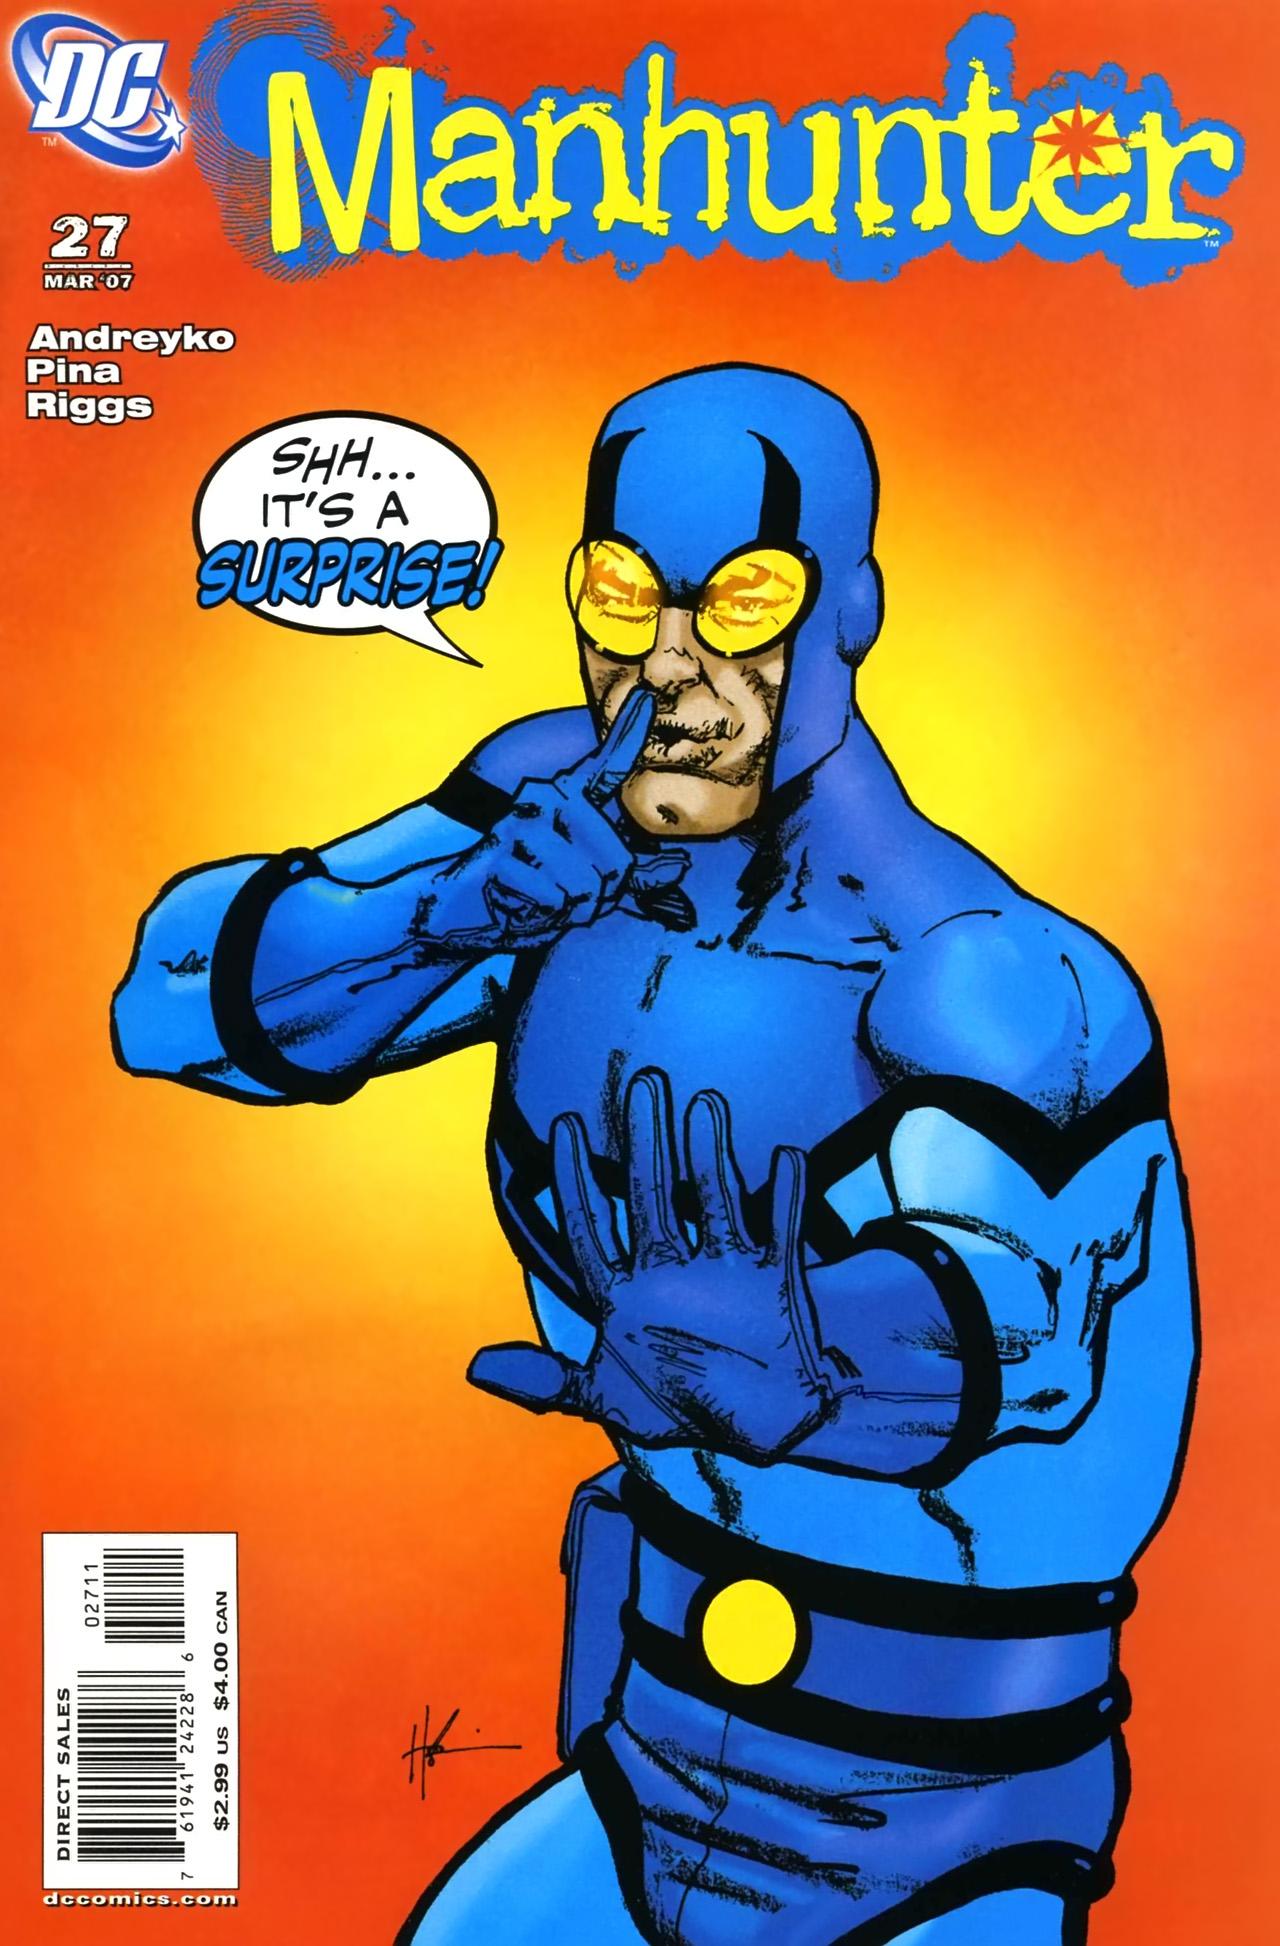 Manhunter (2004) issue 27 - Page 1